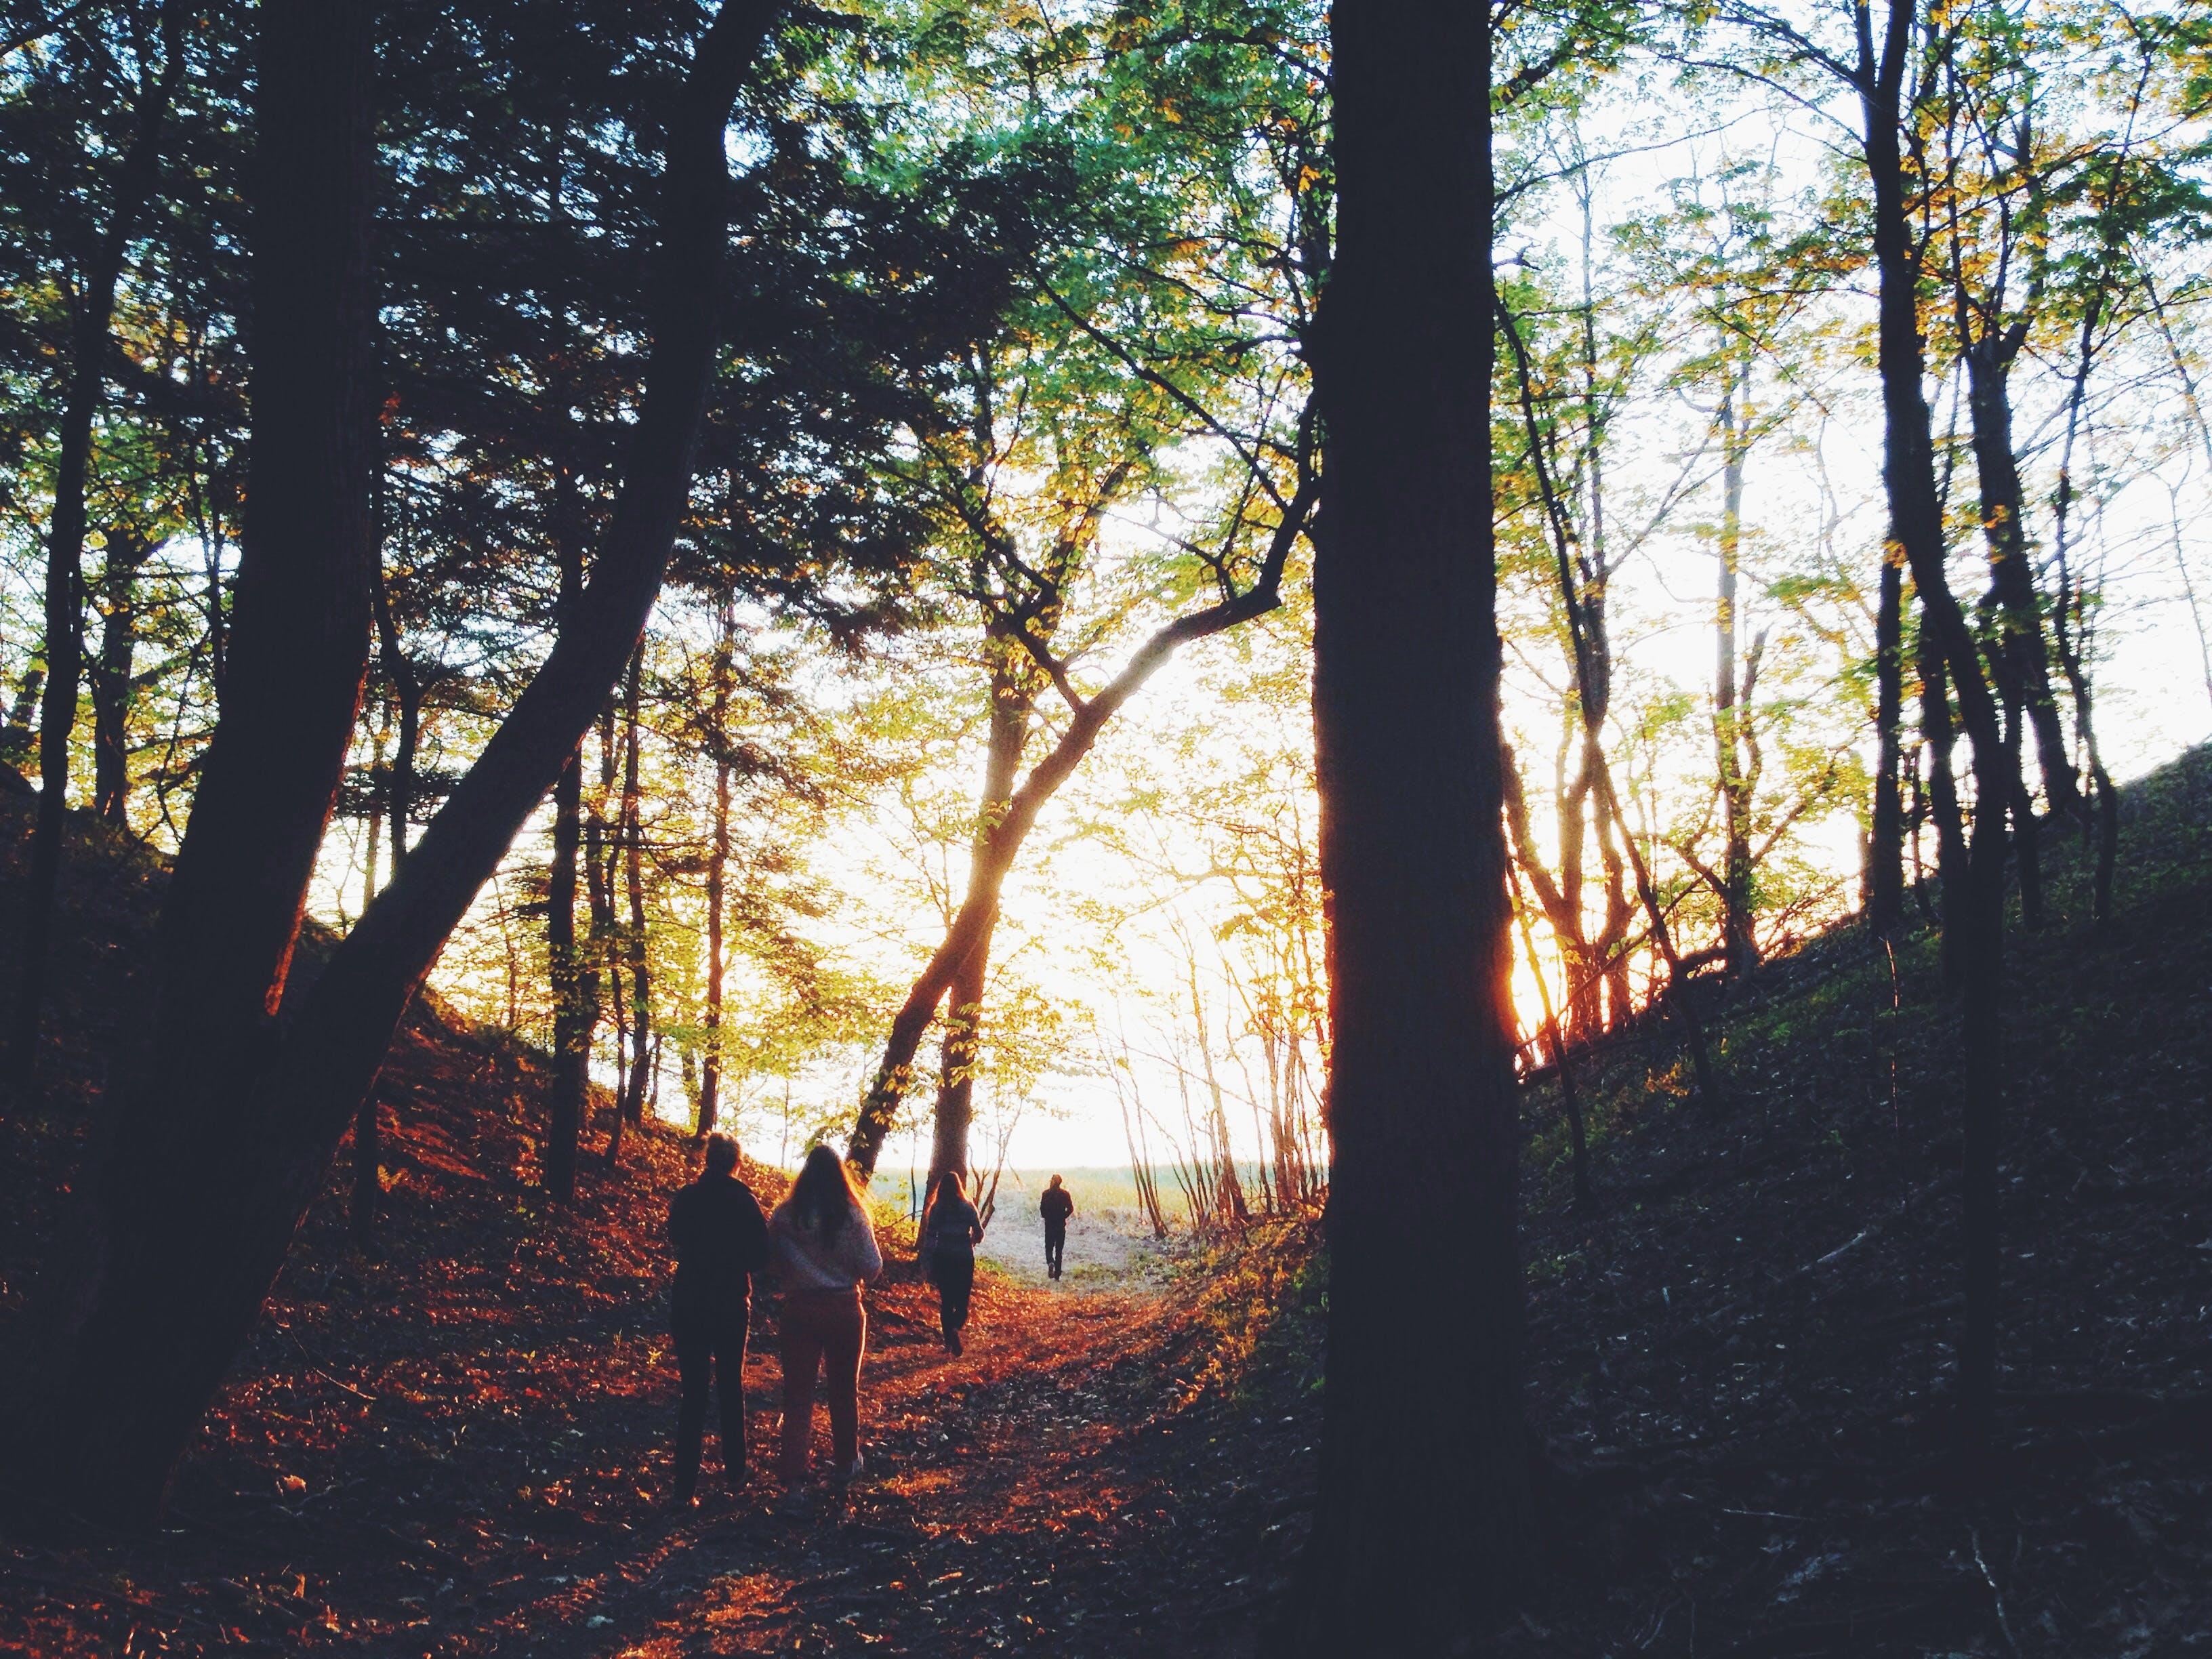 People Walking on Pathway